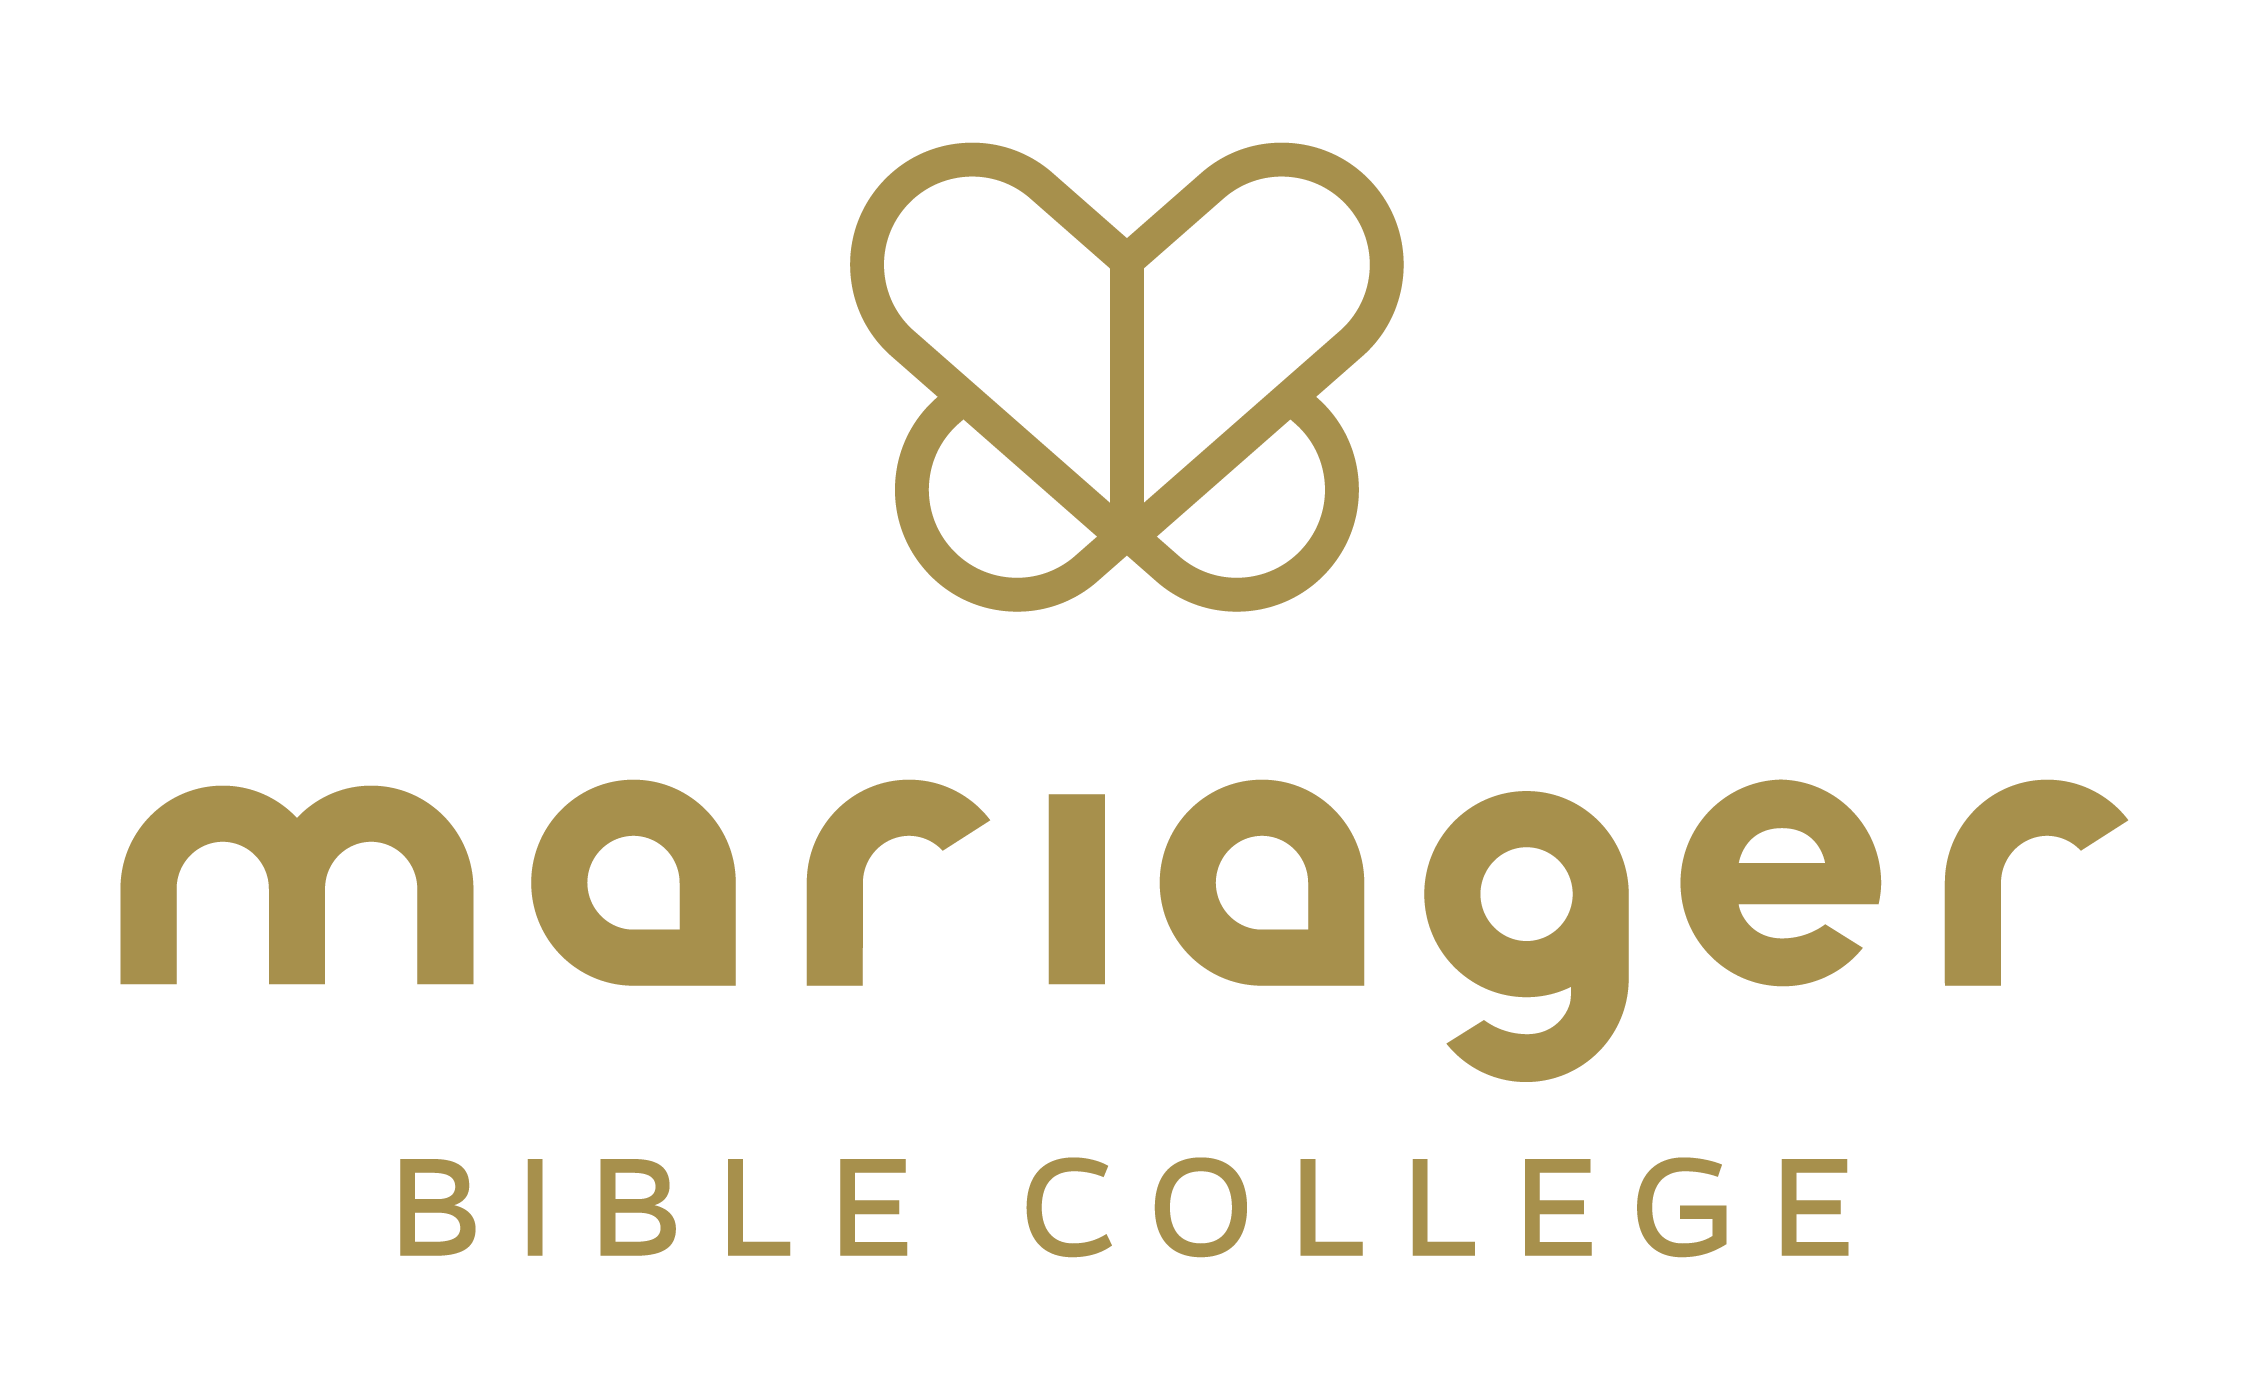 Mariager Bible College Logo